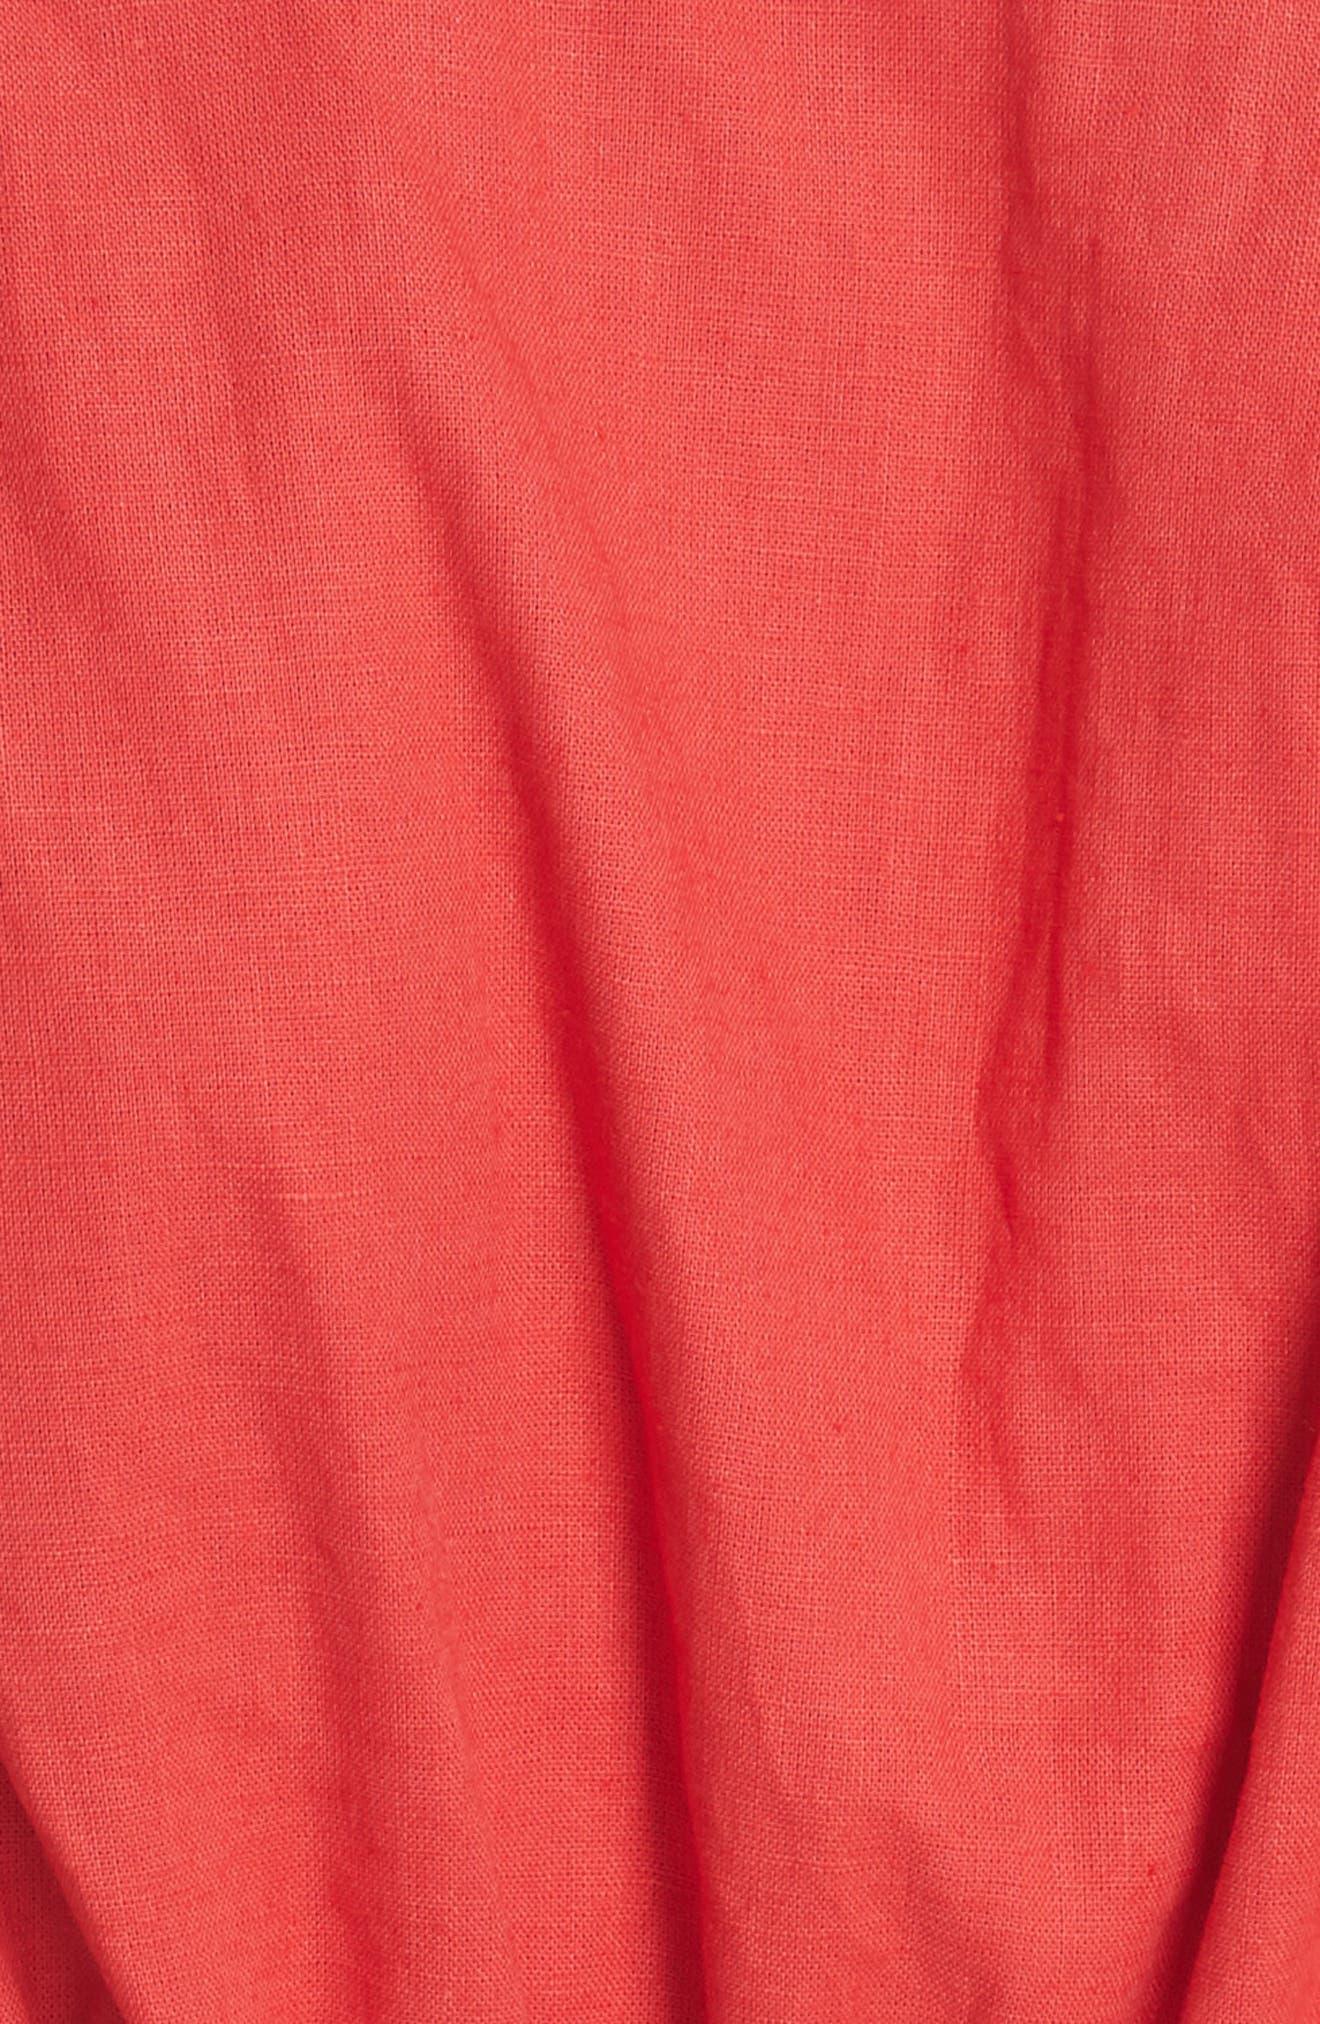 Roll the Dice Minidress,                             Alternate thumbnail 7, color,                             600